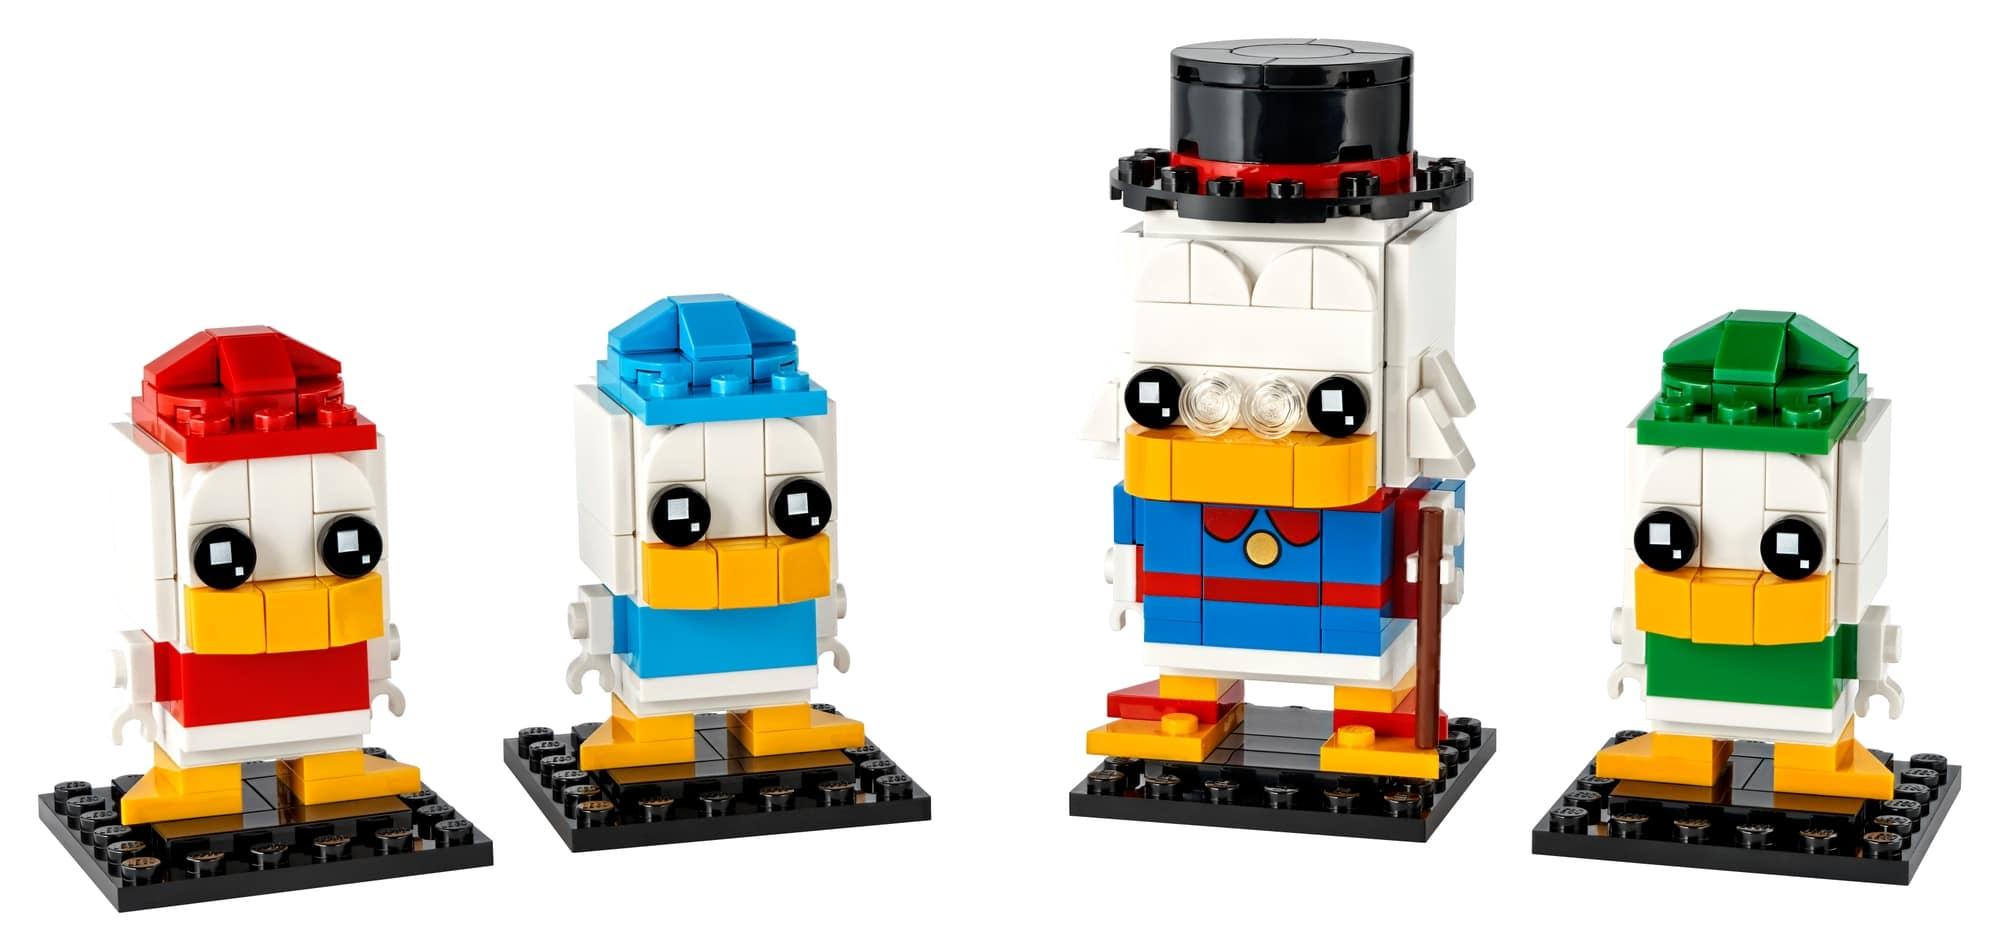 LEGO Disney 40477 Dagobert Duck, Tick, Trick & Track 1